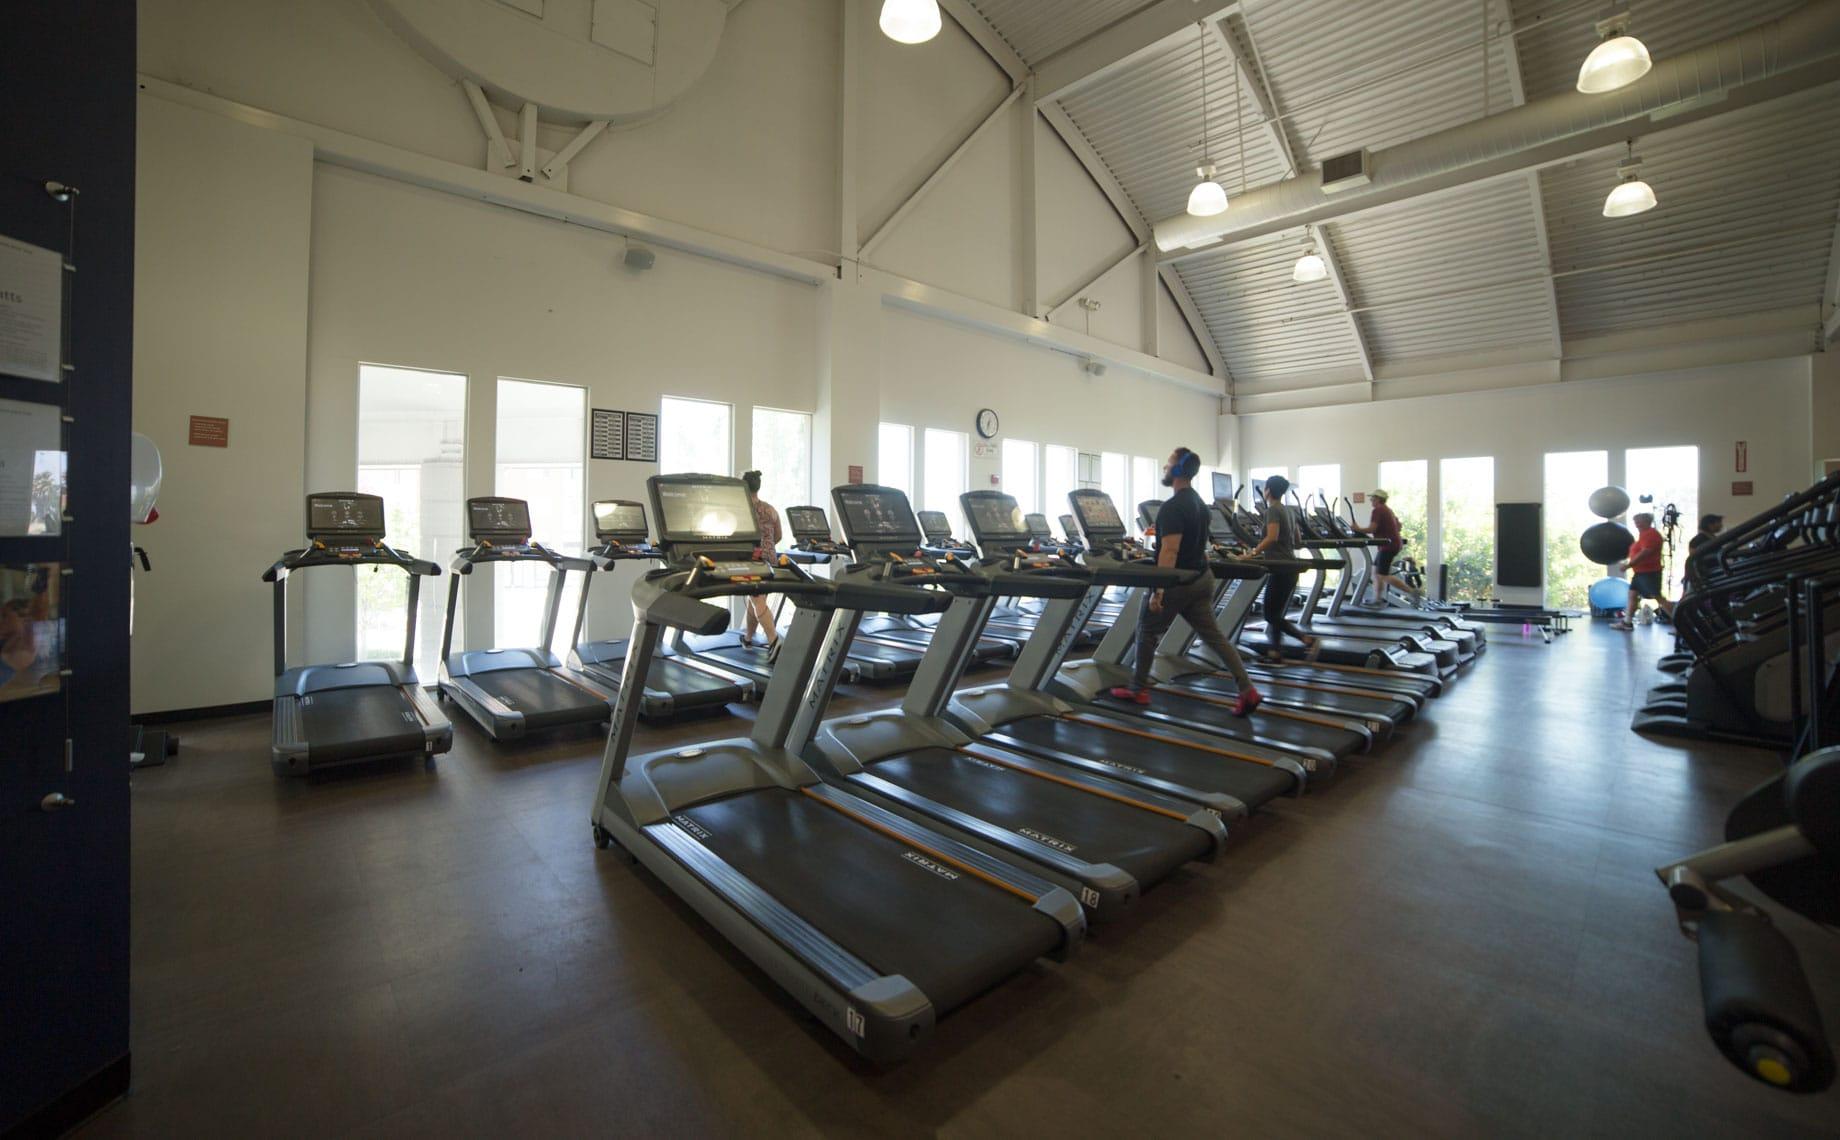 Treadmills at the PJCC Fitness Center